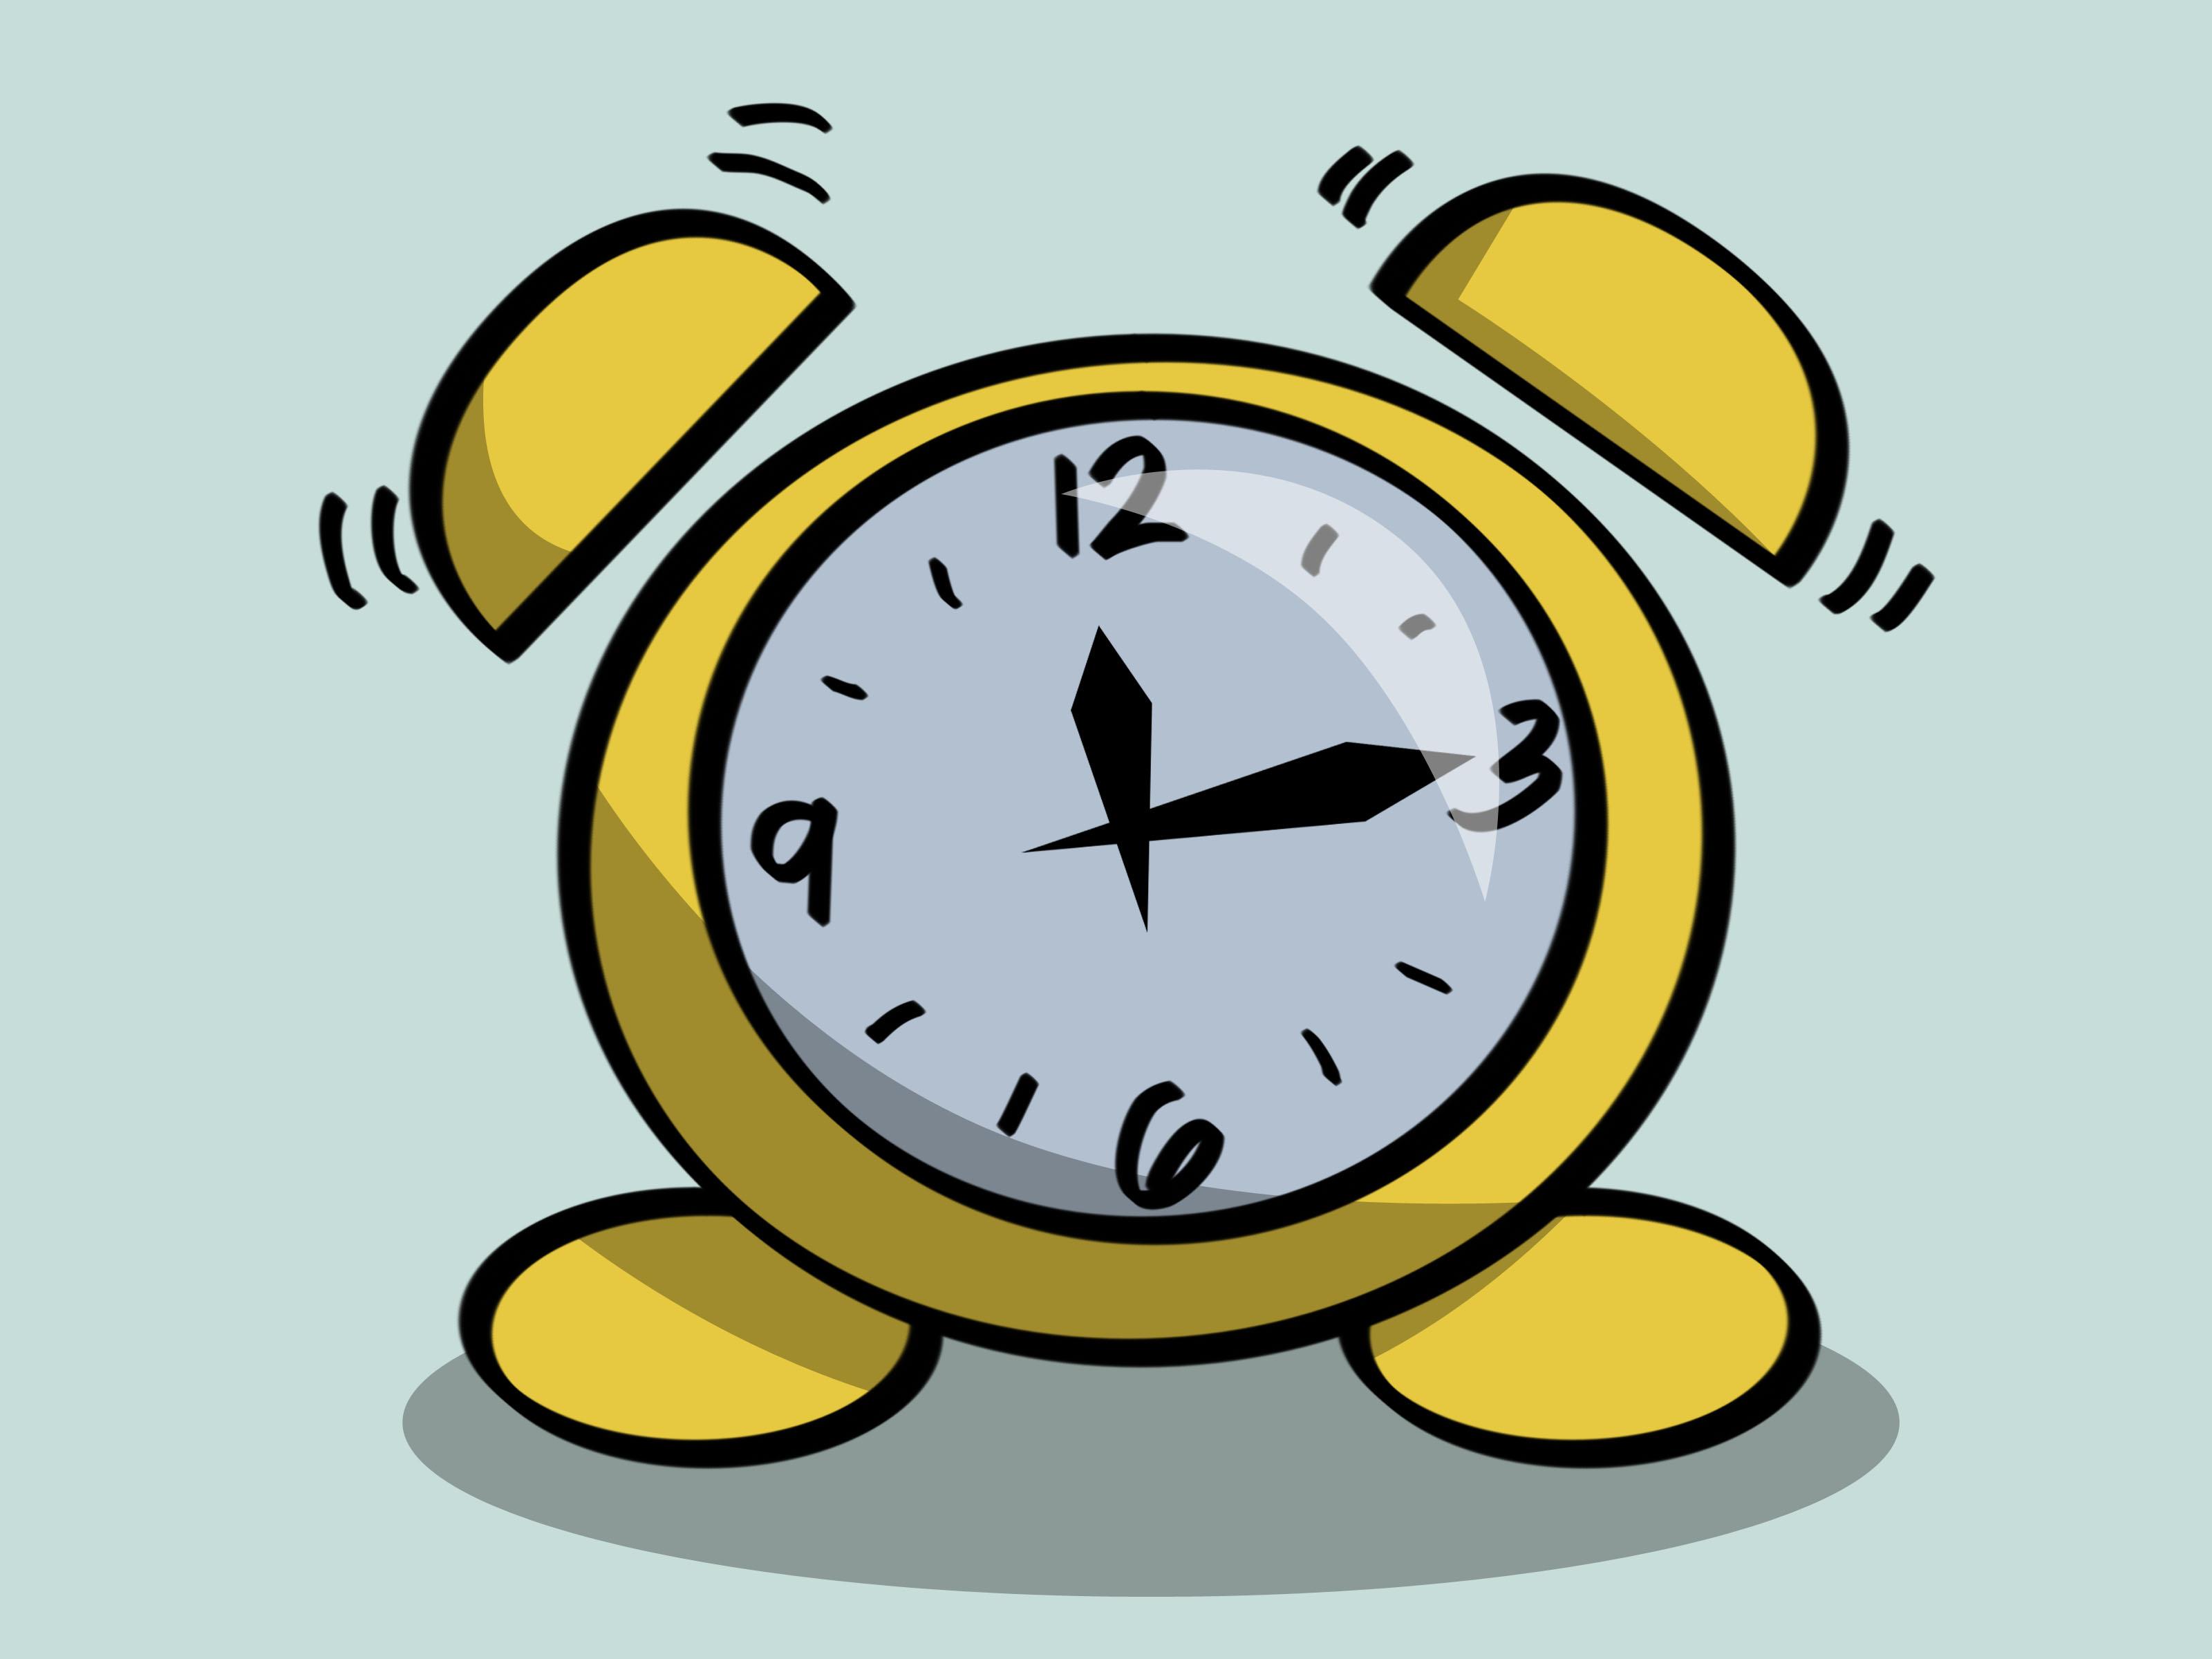 3200x2400 Alarm Clock The Real Chrisparkle